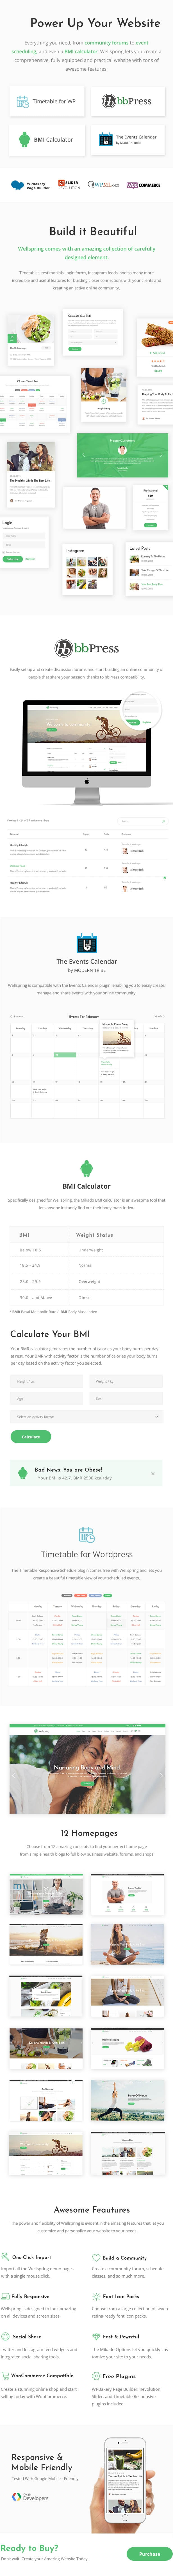 01b - Wellspring - Health, Lifestyle & Wellness Theme